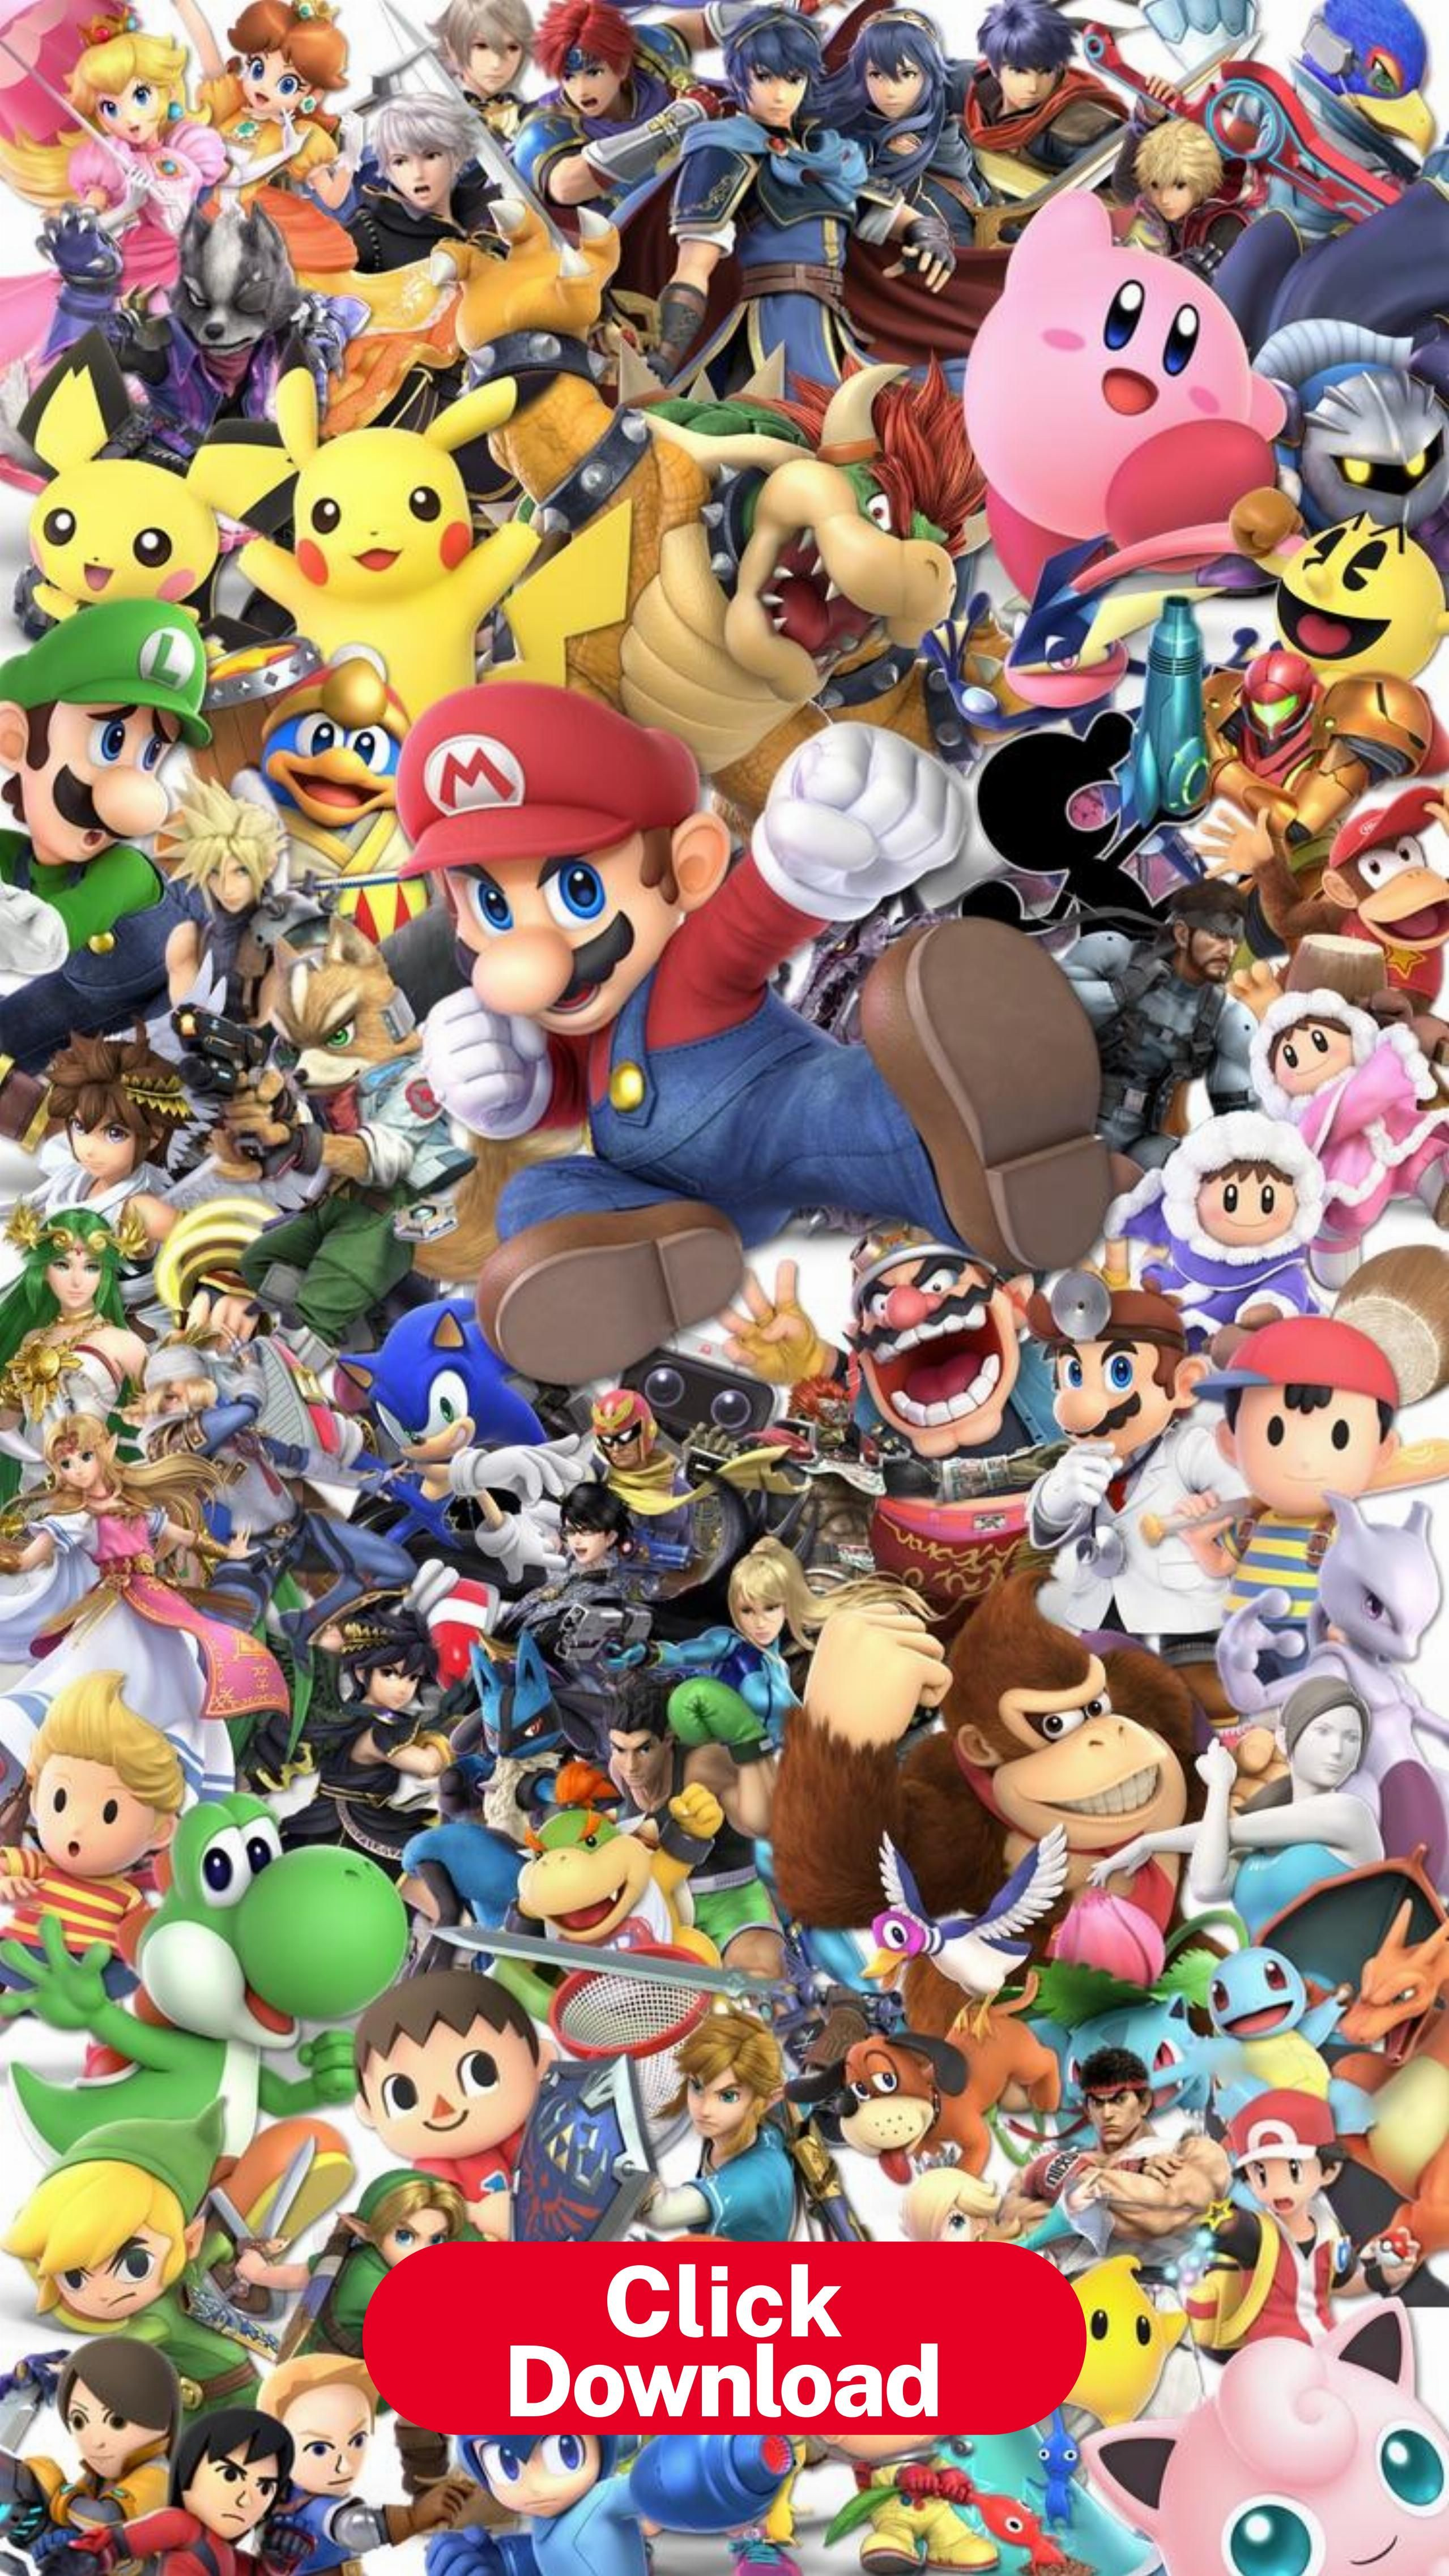 I Made A Phone Wallpaper With Every Character Render Smashbros Super Mario Art Mario Art Wallpaper